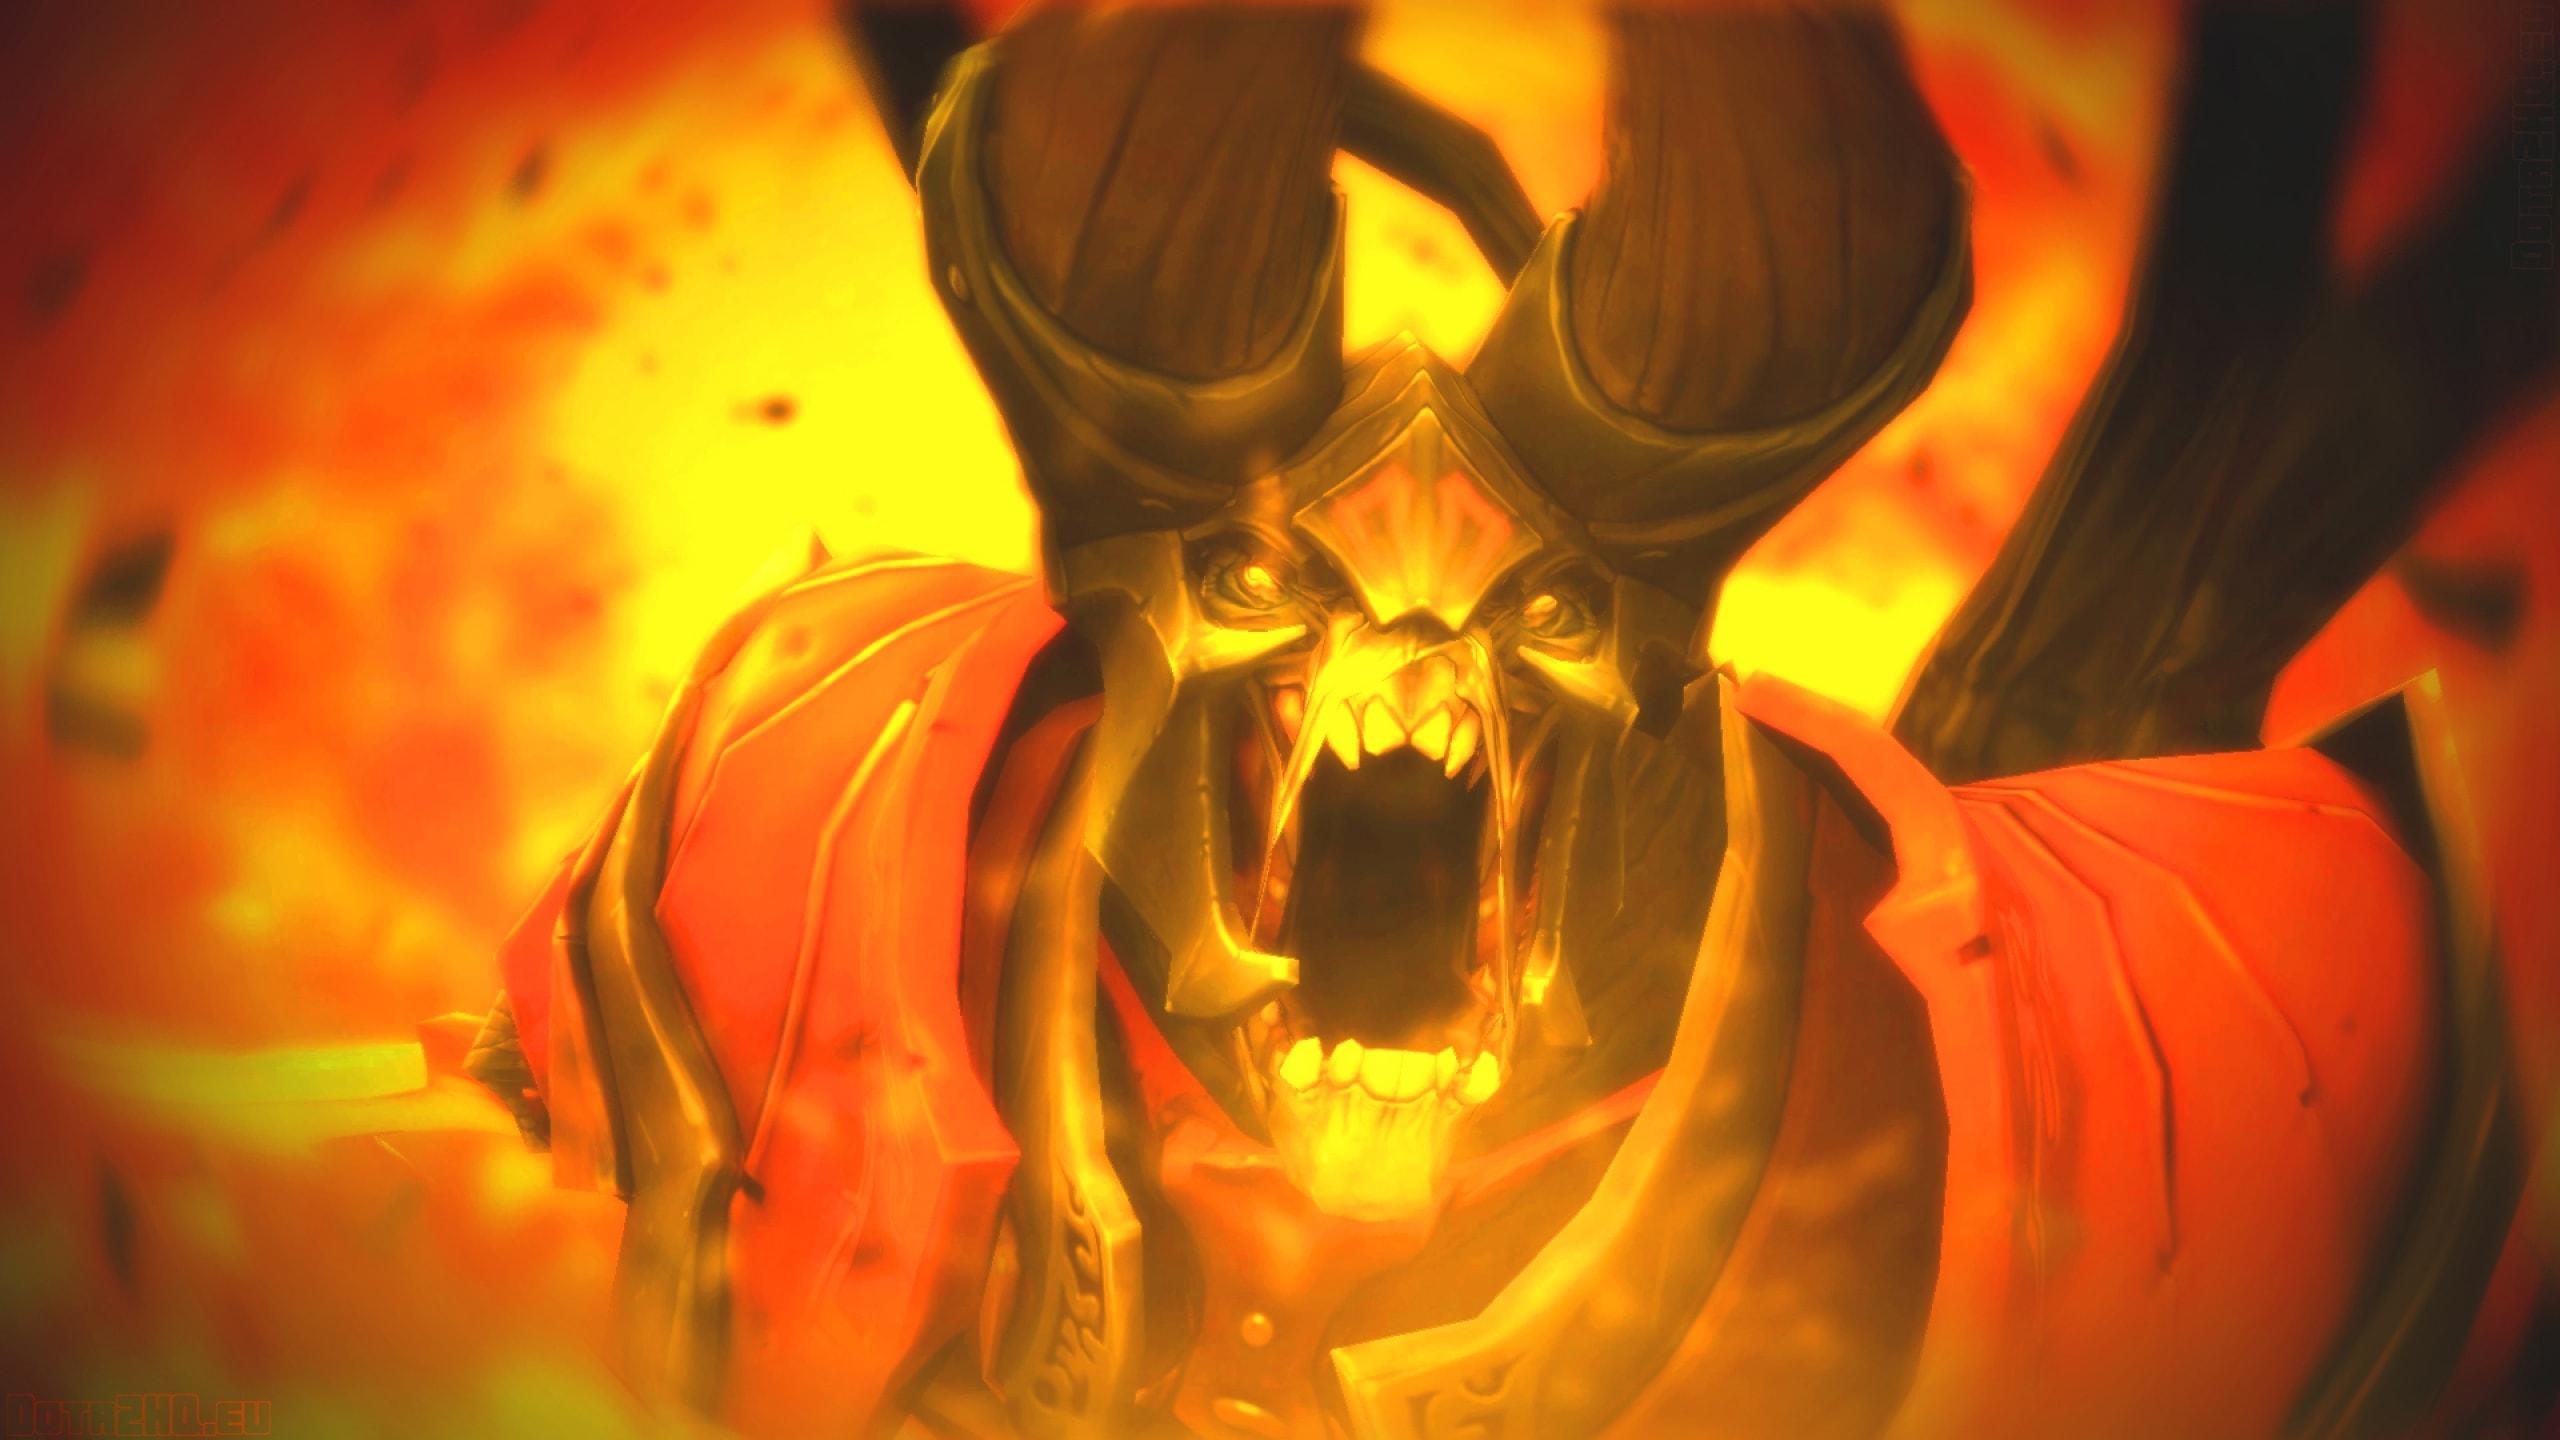 Dota2 : Doom full hd wallpapers